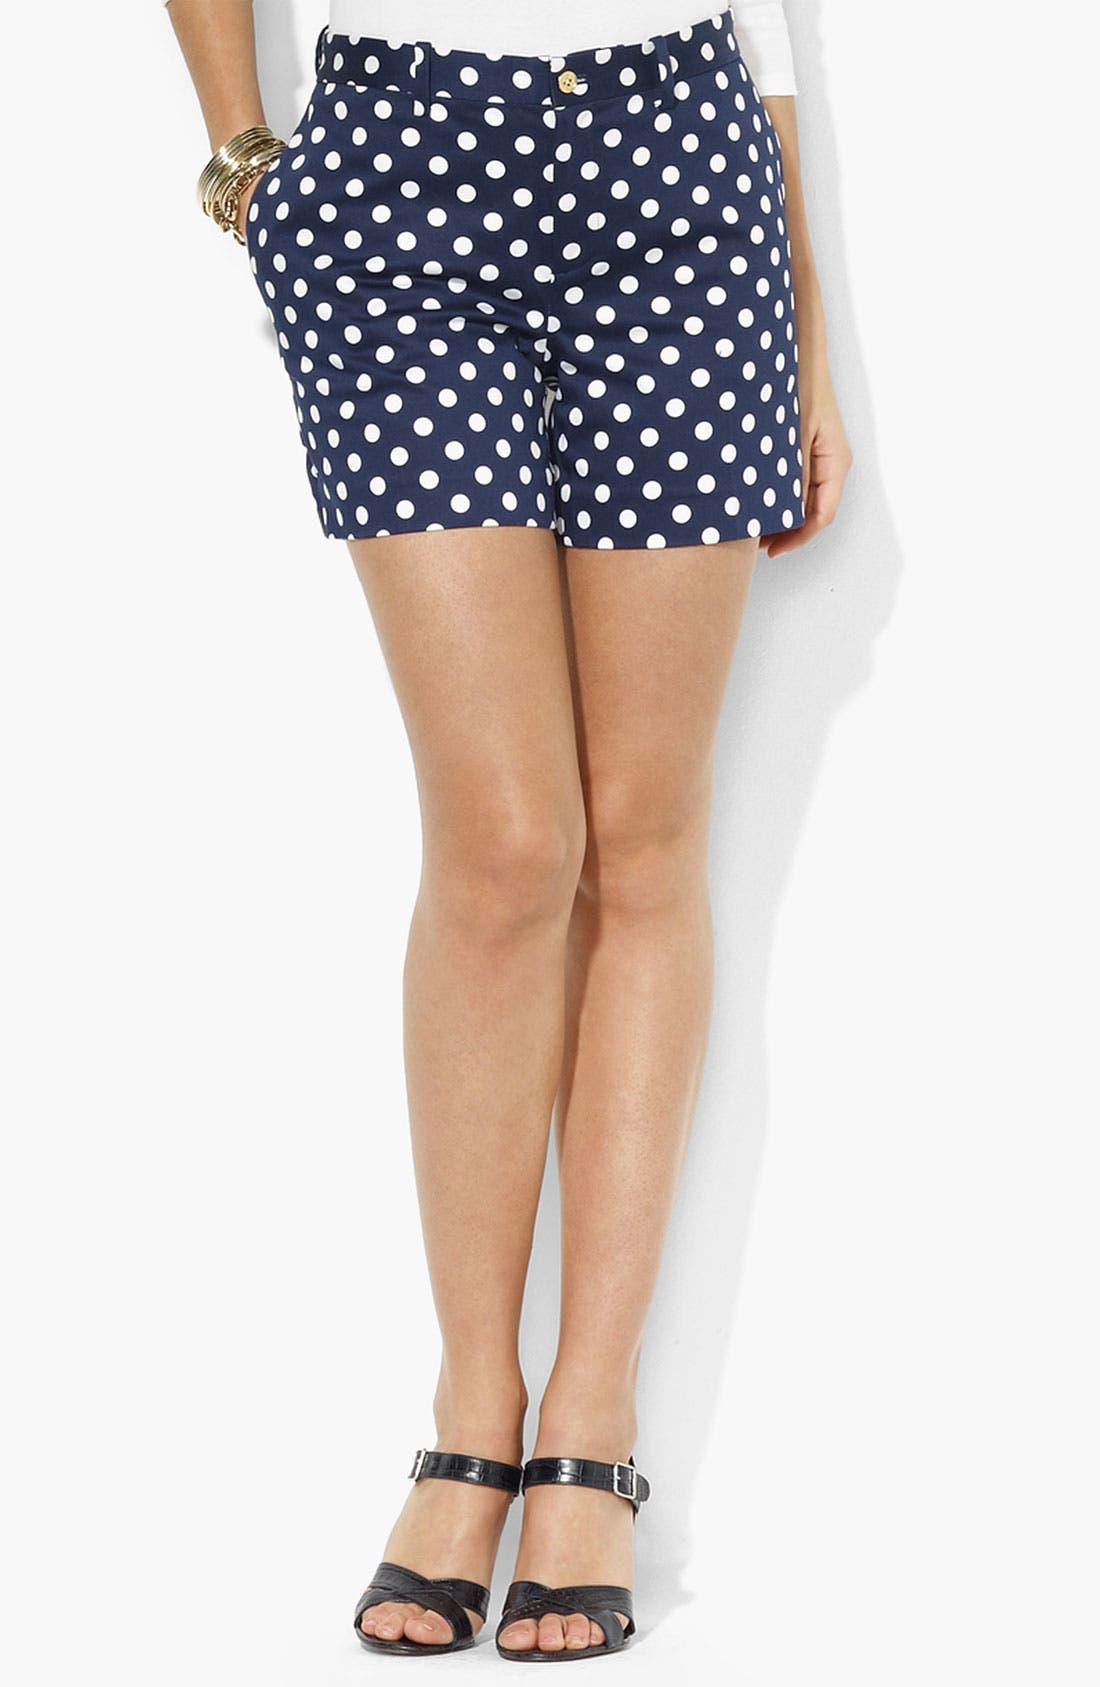 Alternate Image 1 Selected - Lauren Ralph Lauren Polka Dot Shorts (Petite)